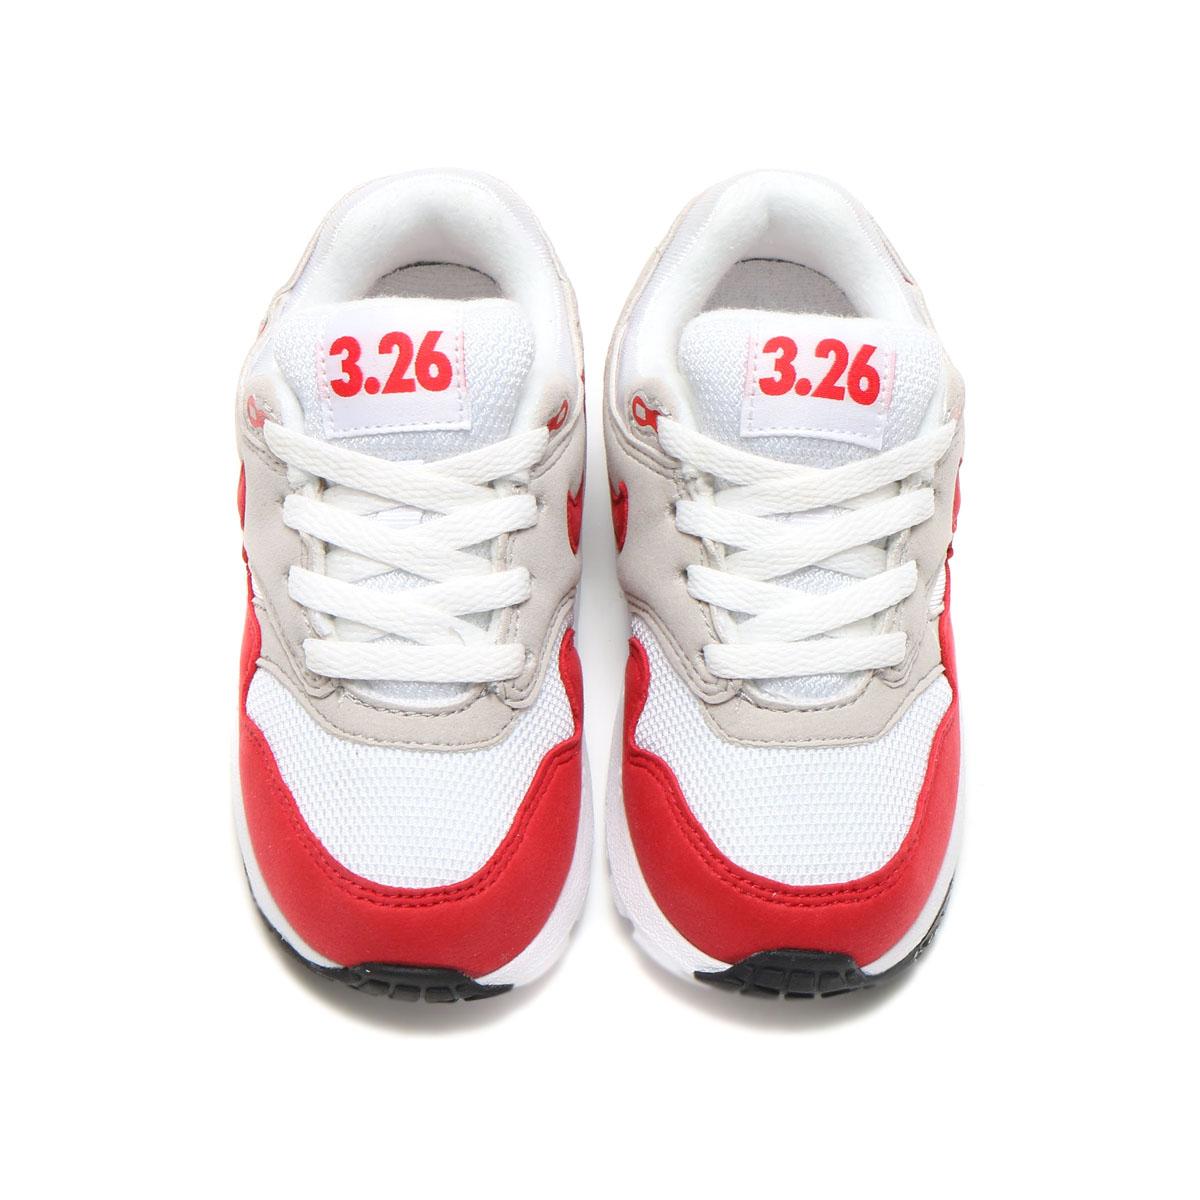 NIKE AIR MAX 1 QS (TD) (나이키 에어 막스 1 QS TD) (WHITE/UNIVERSITY RED-NEUTRAL GREY-BLACK) 17 SU-S